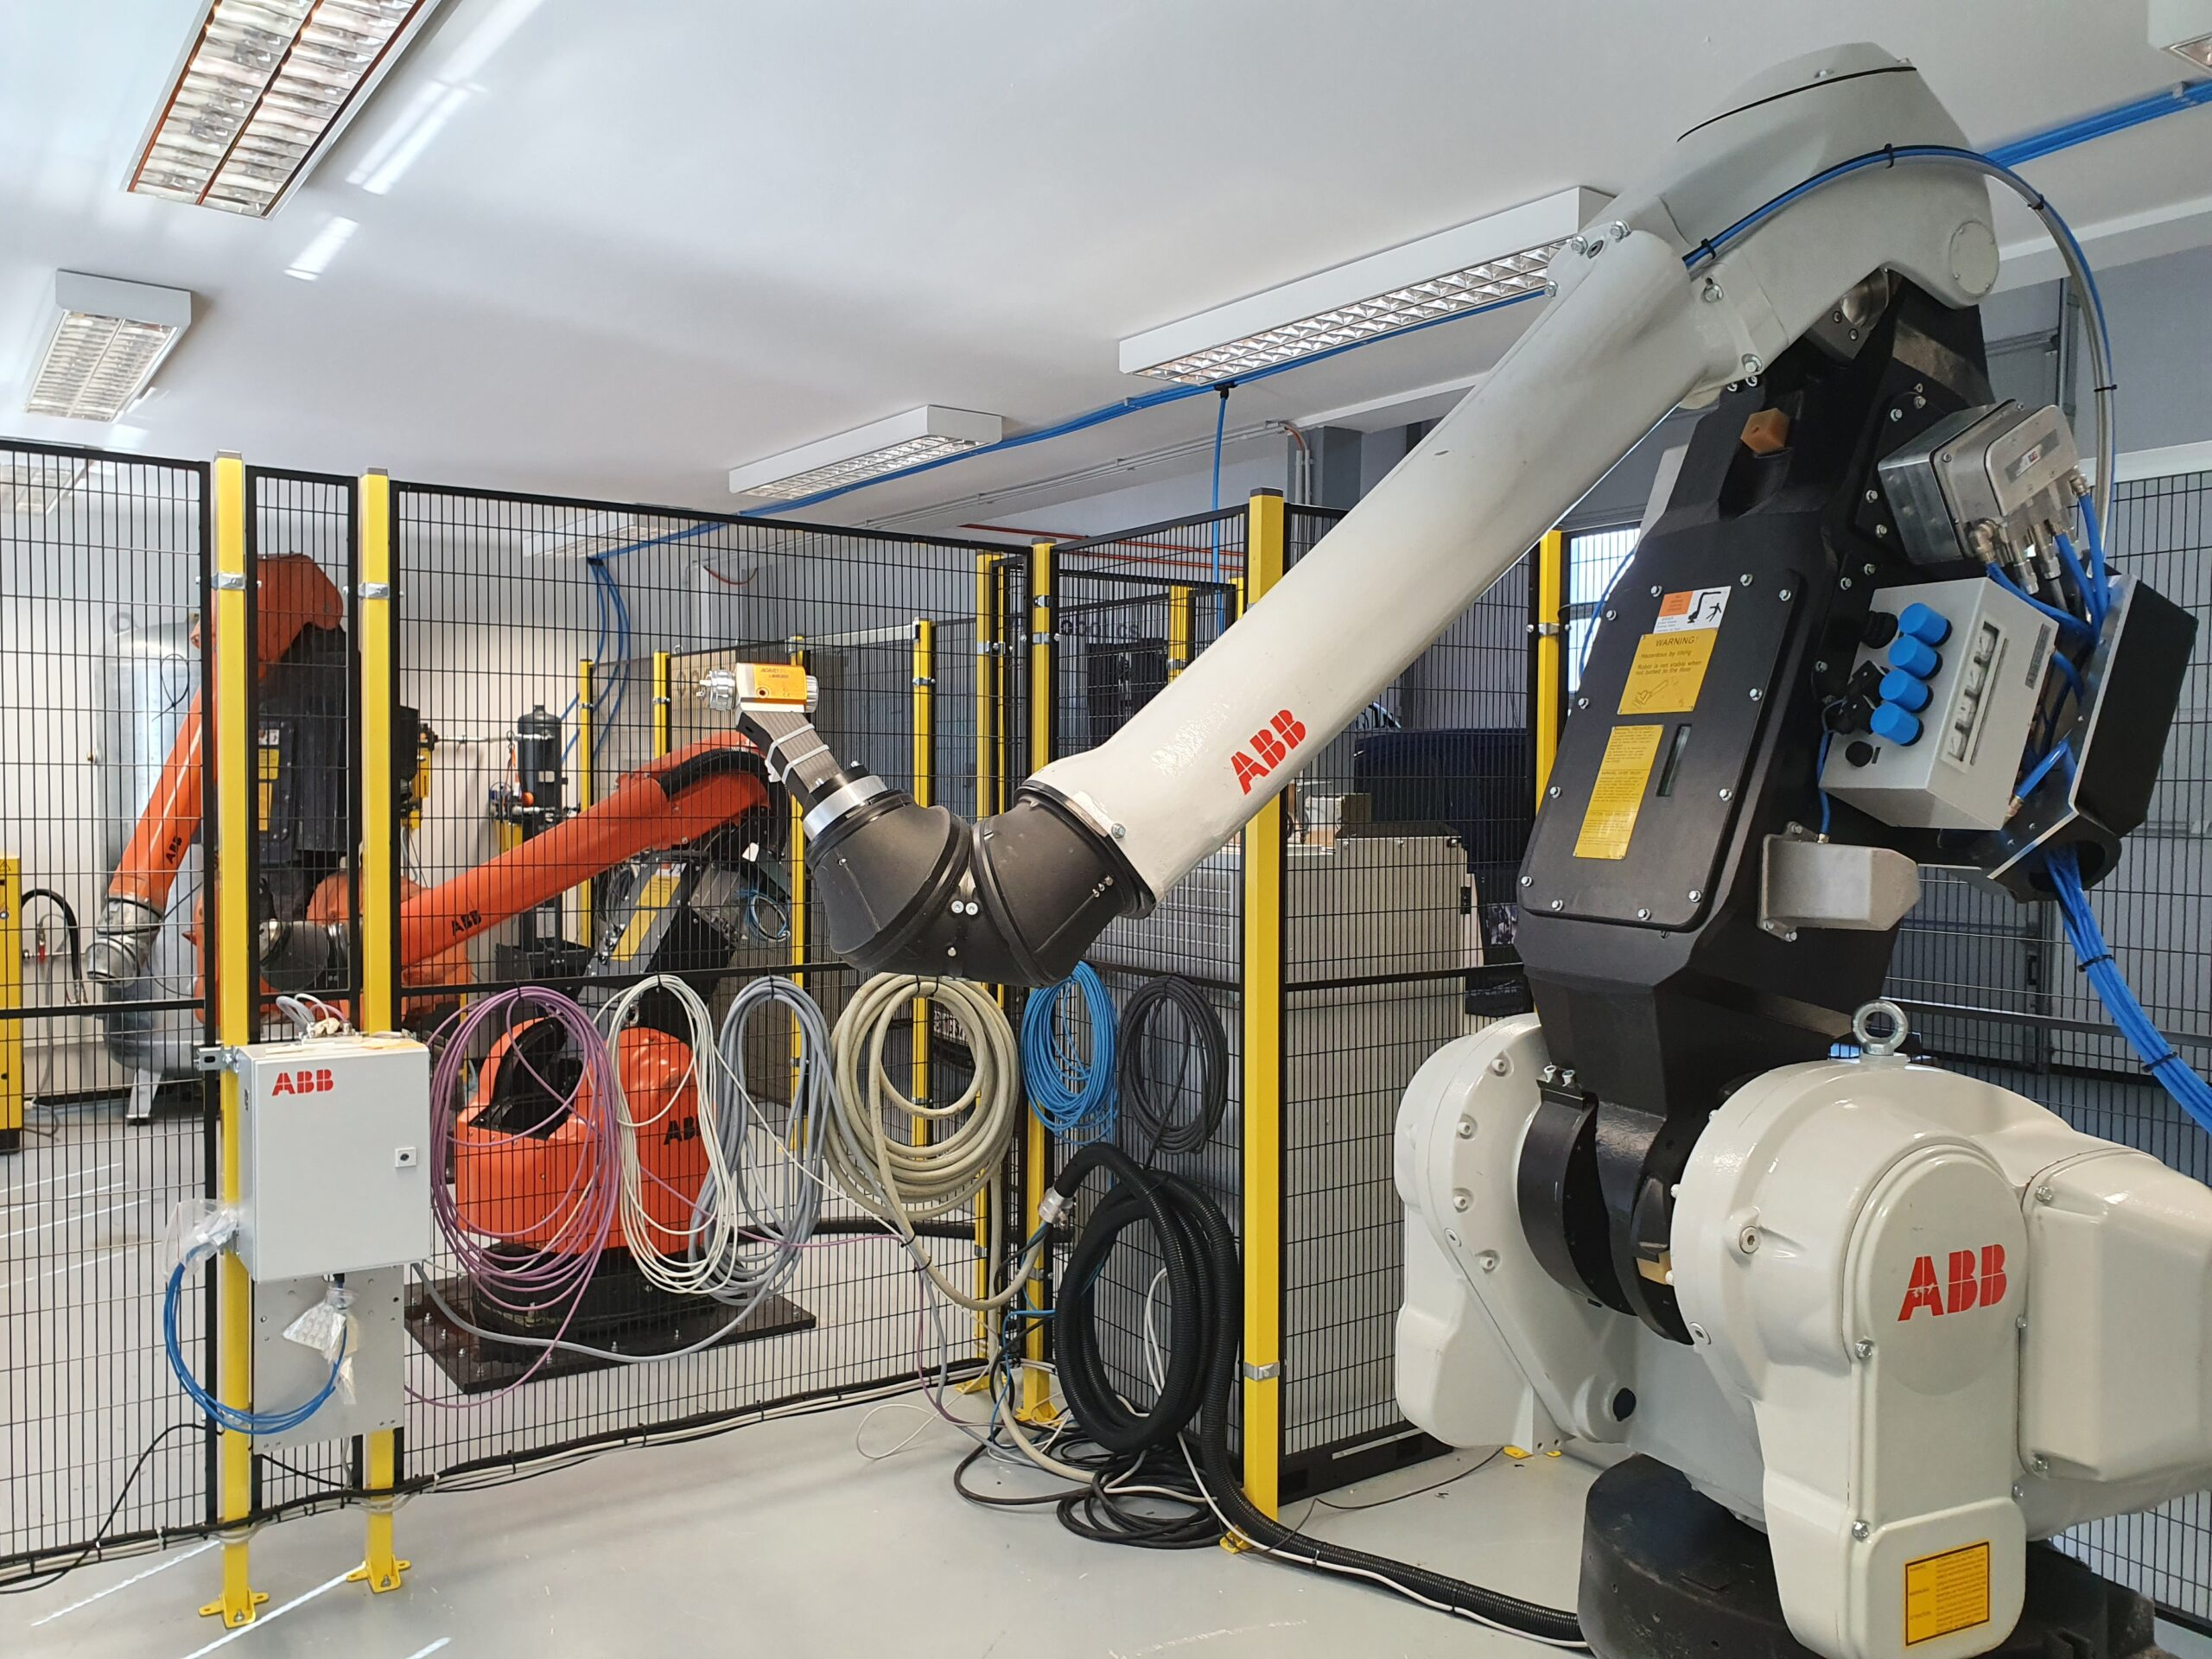 3 generations of ABB paint robots